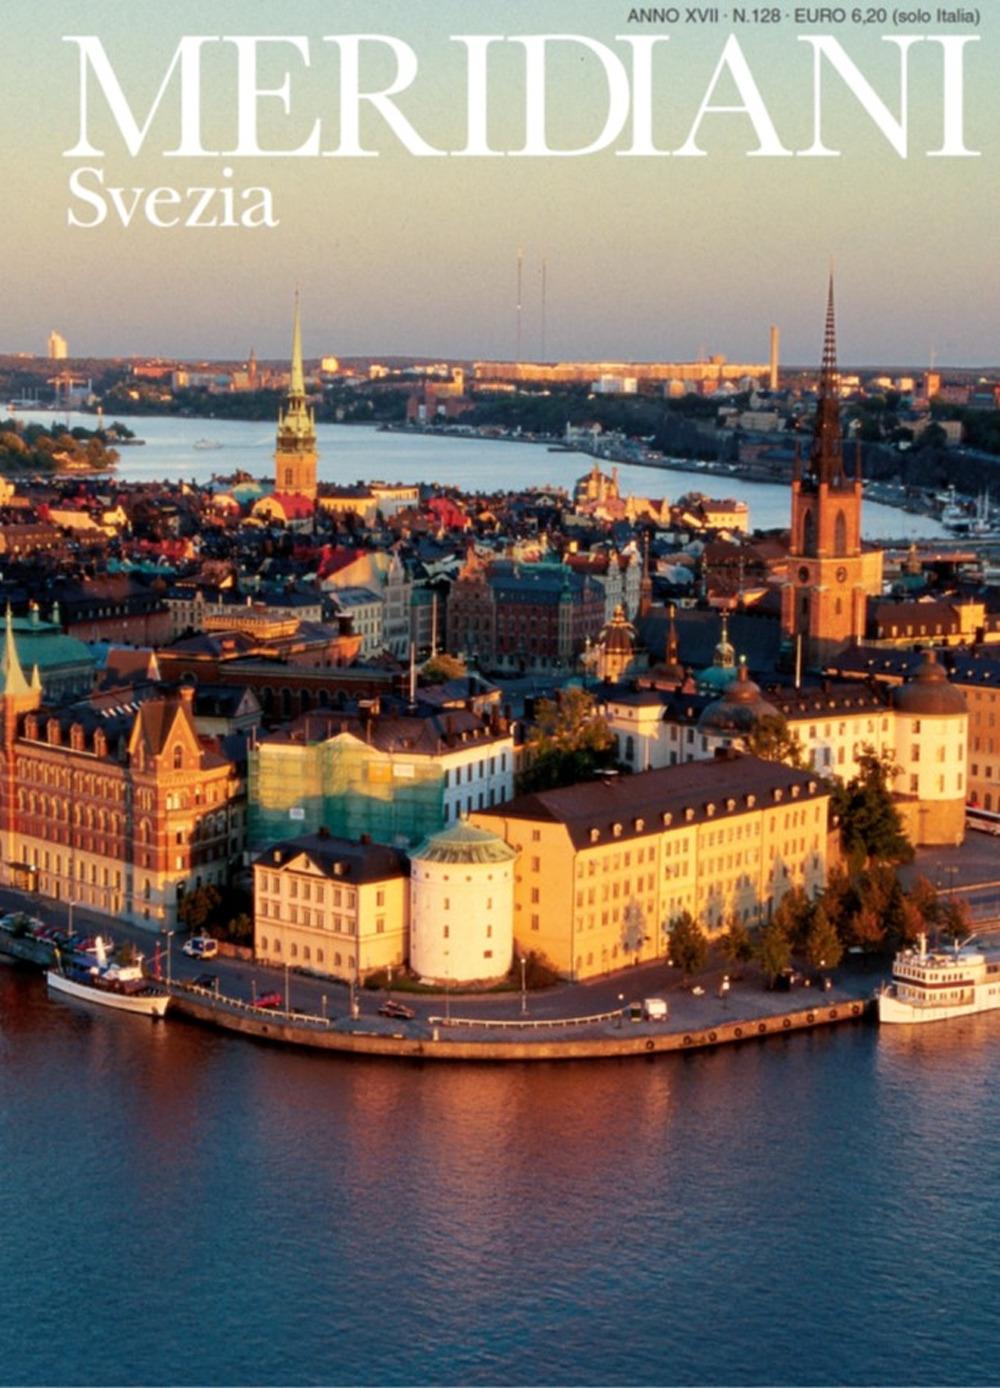 Svezia.